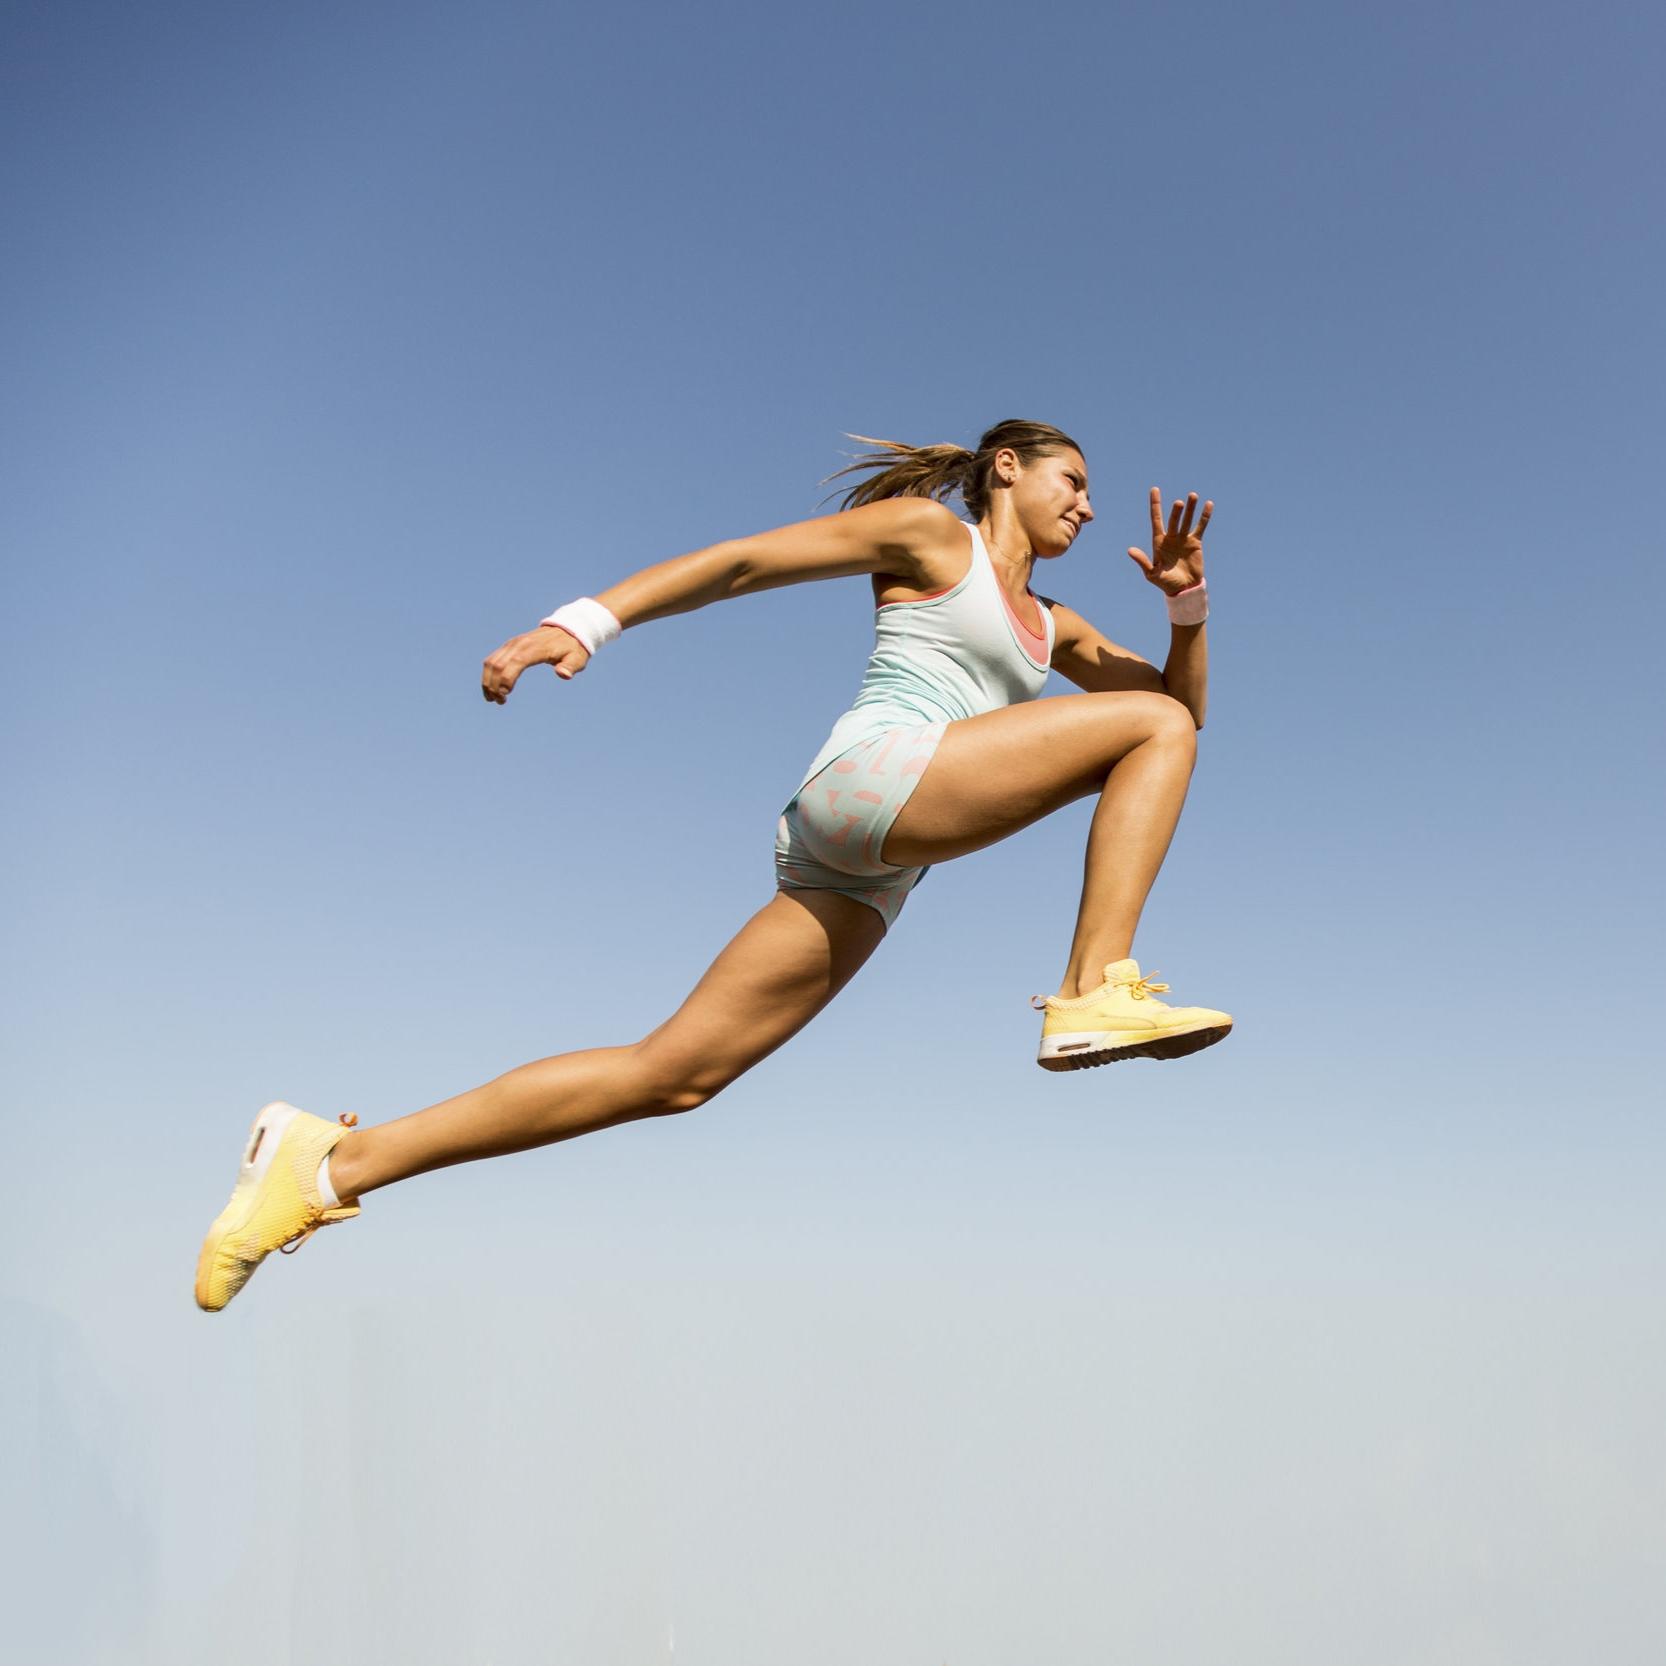 female-athlete-running-jumping